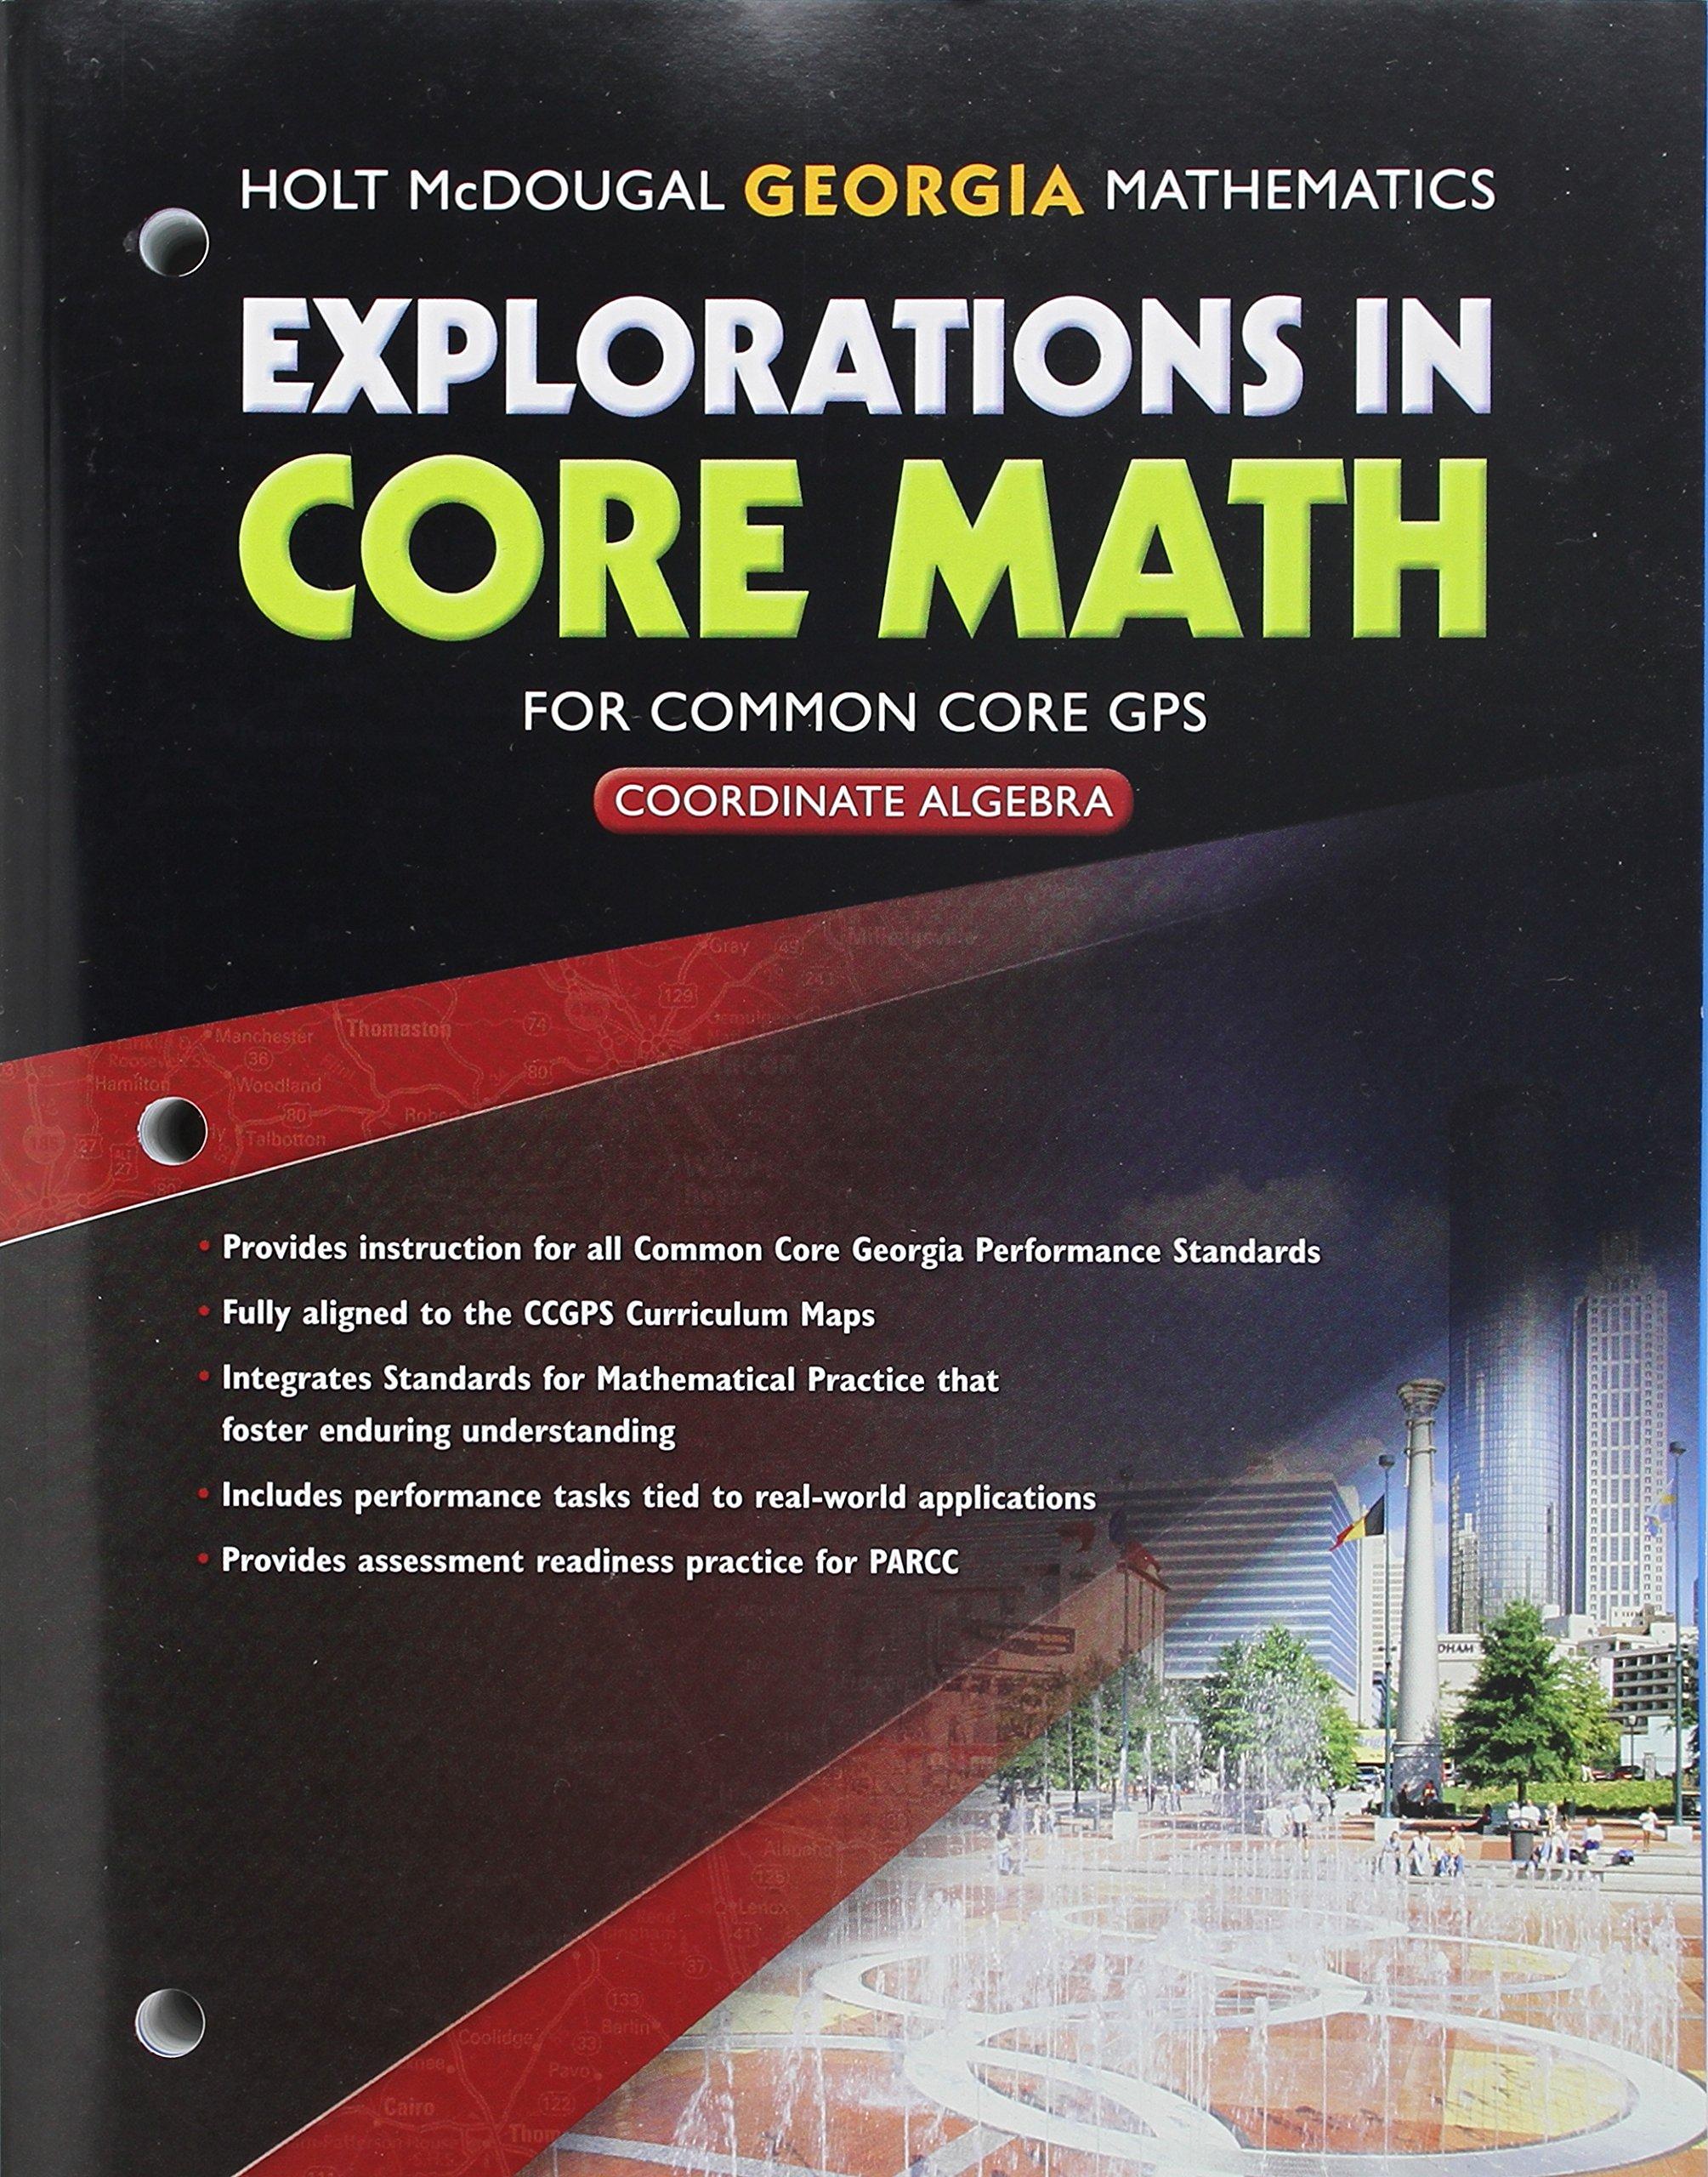 Explorations in Core Math: Common Core GPS Student Edition 2014